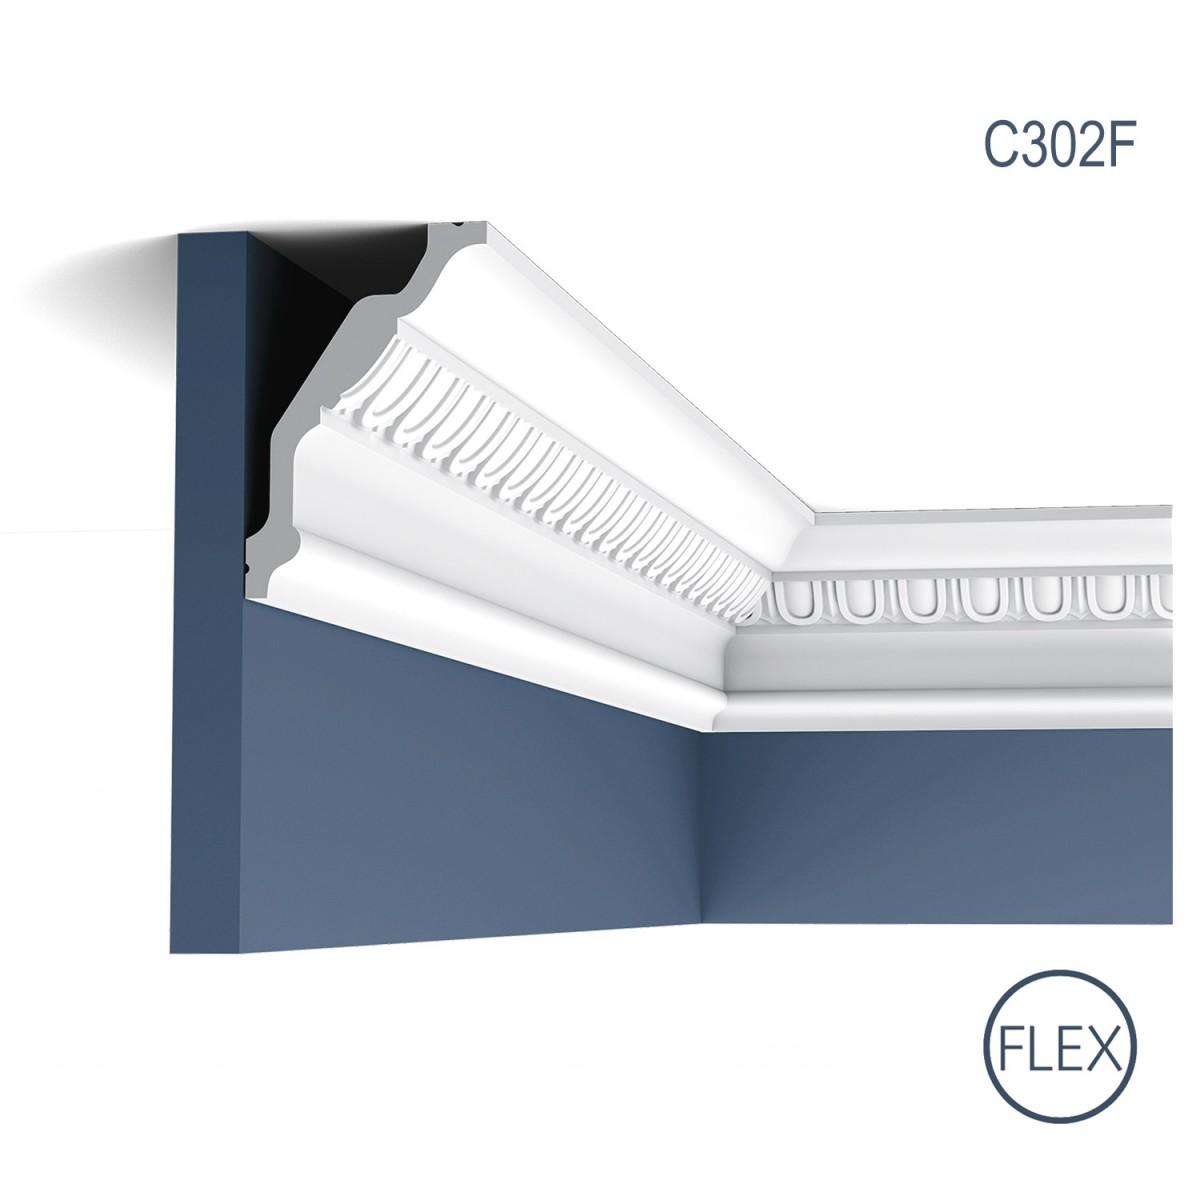 Cornisa Flex Luxxus C302F, Dimensiuni: 200 X 12.8 X 8.5 cm, Orac Decor